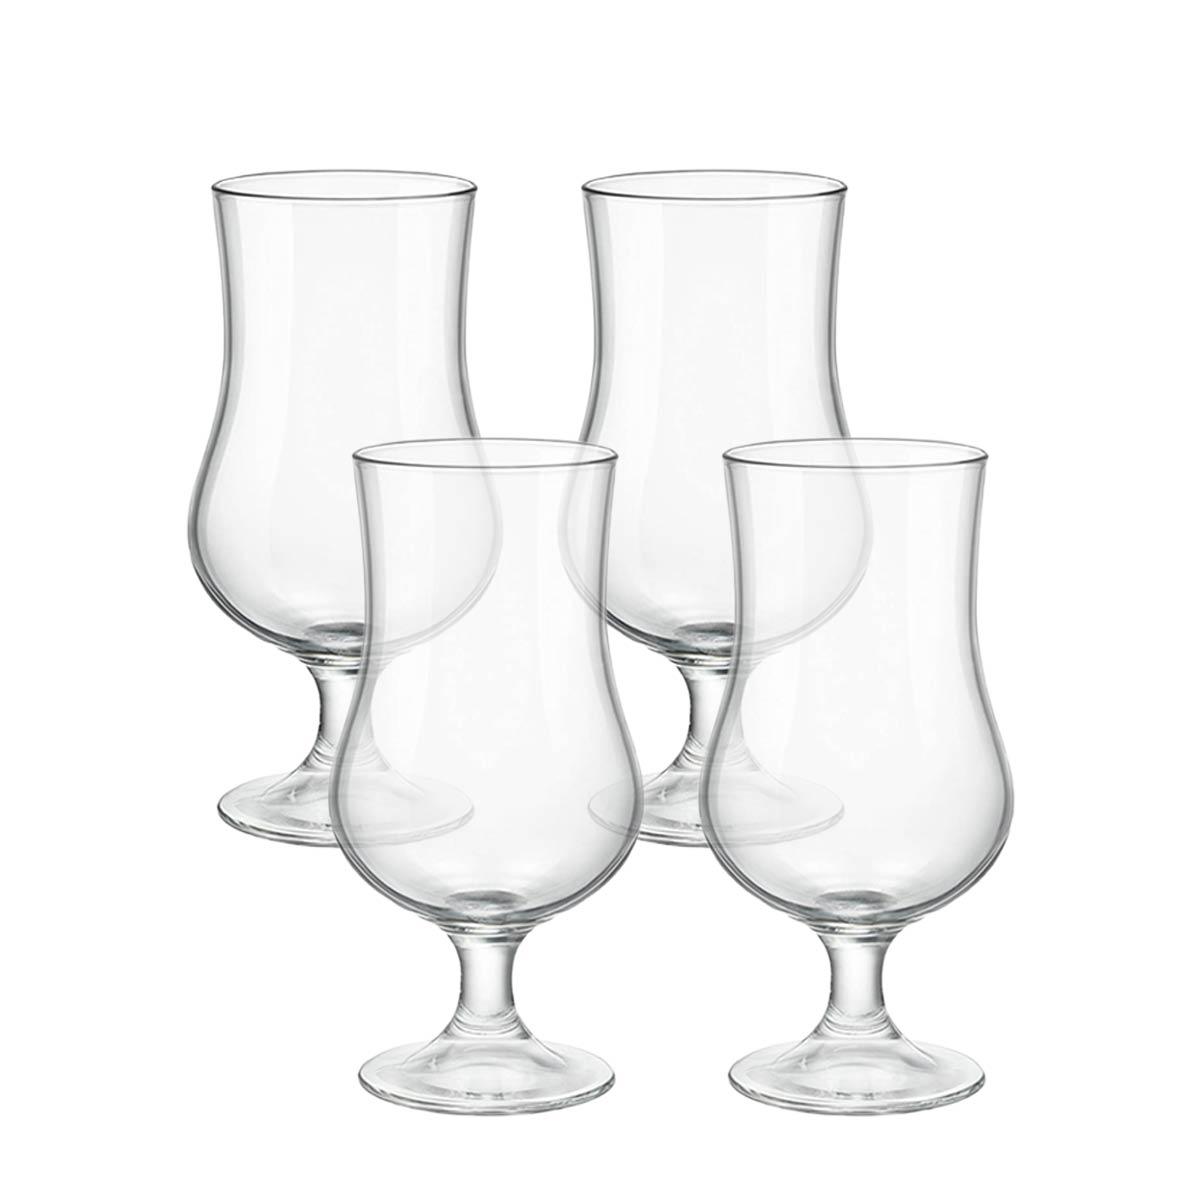 Kit 4 Taças Cerveja de Vidro Transparente 420 ml  - Lemis